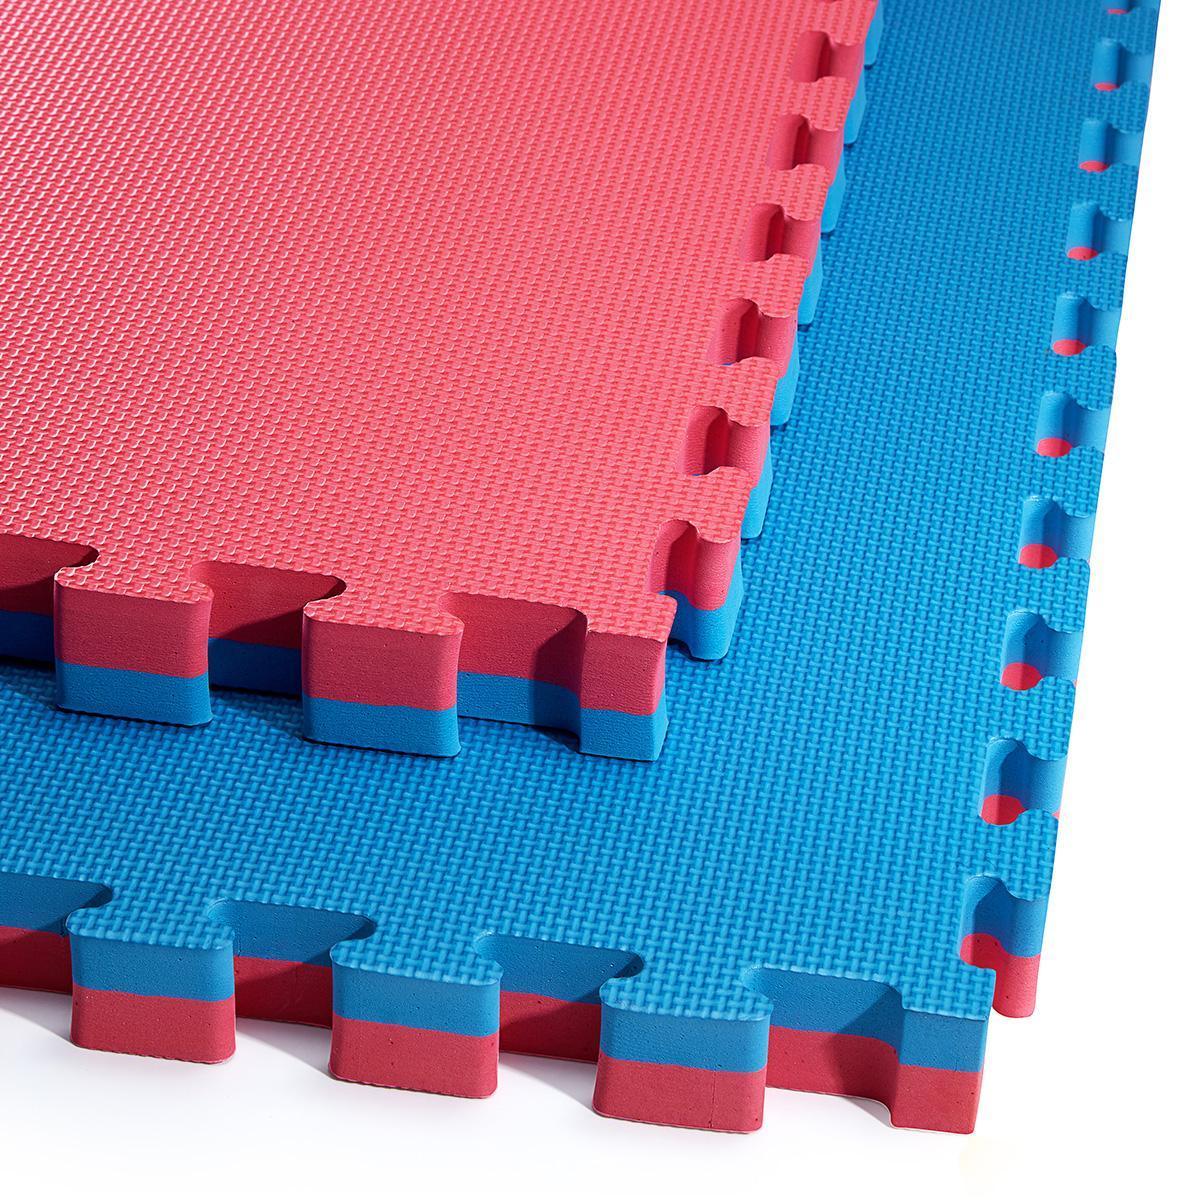 Мат-пазл (ластівчин хвіст) 4FIZJO Mat Puzzle EVA 100 x 100 x 4 см 4FJ0169 Blue/Red